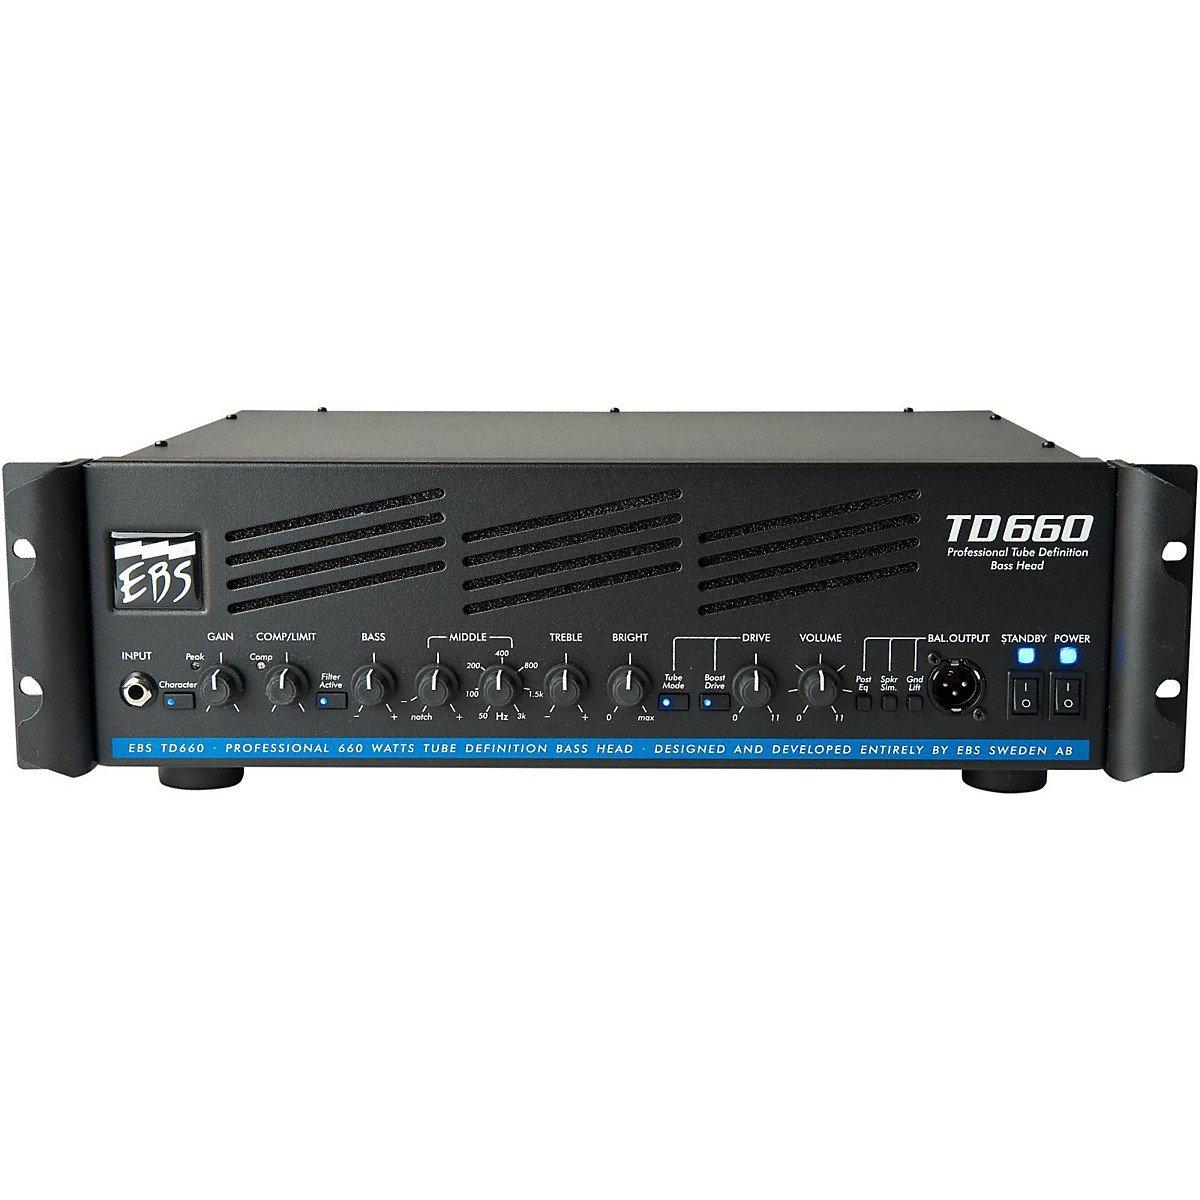 TD660/660W